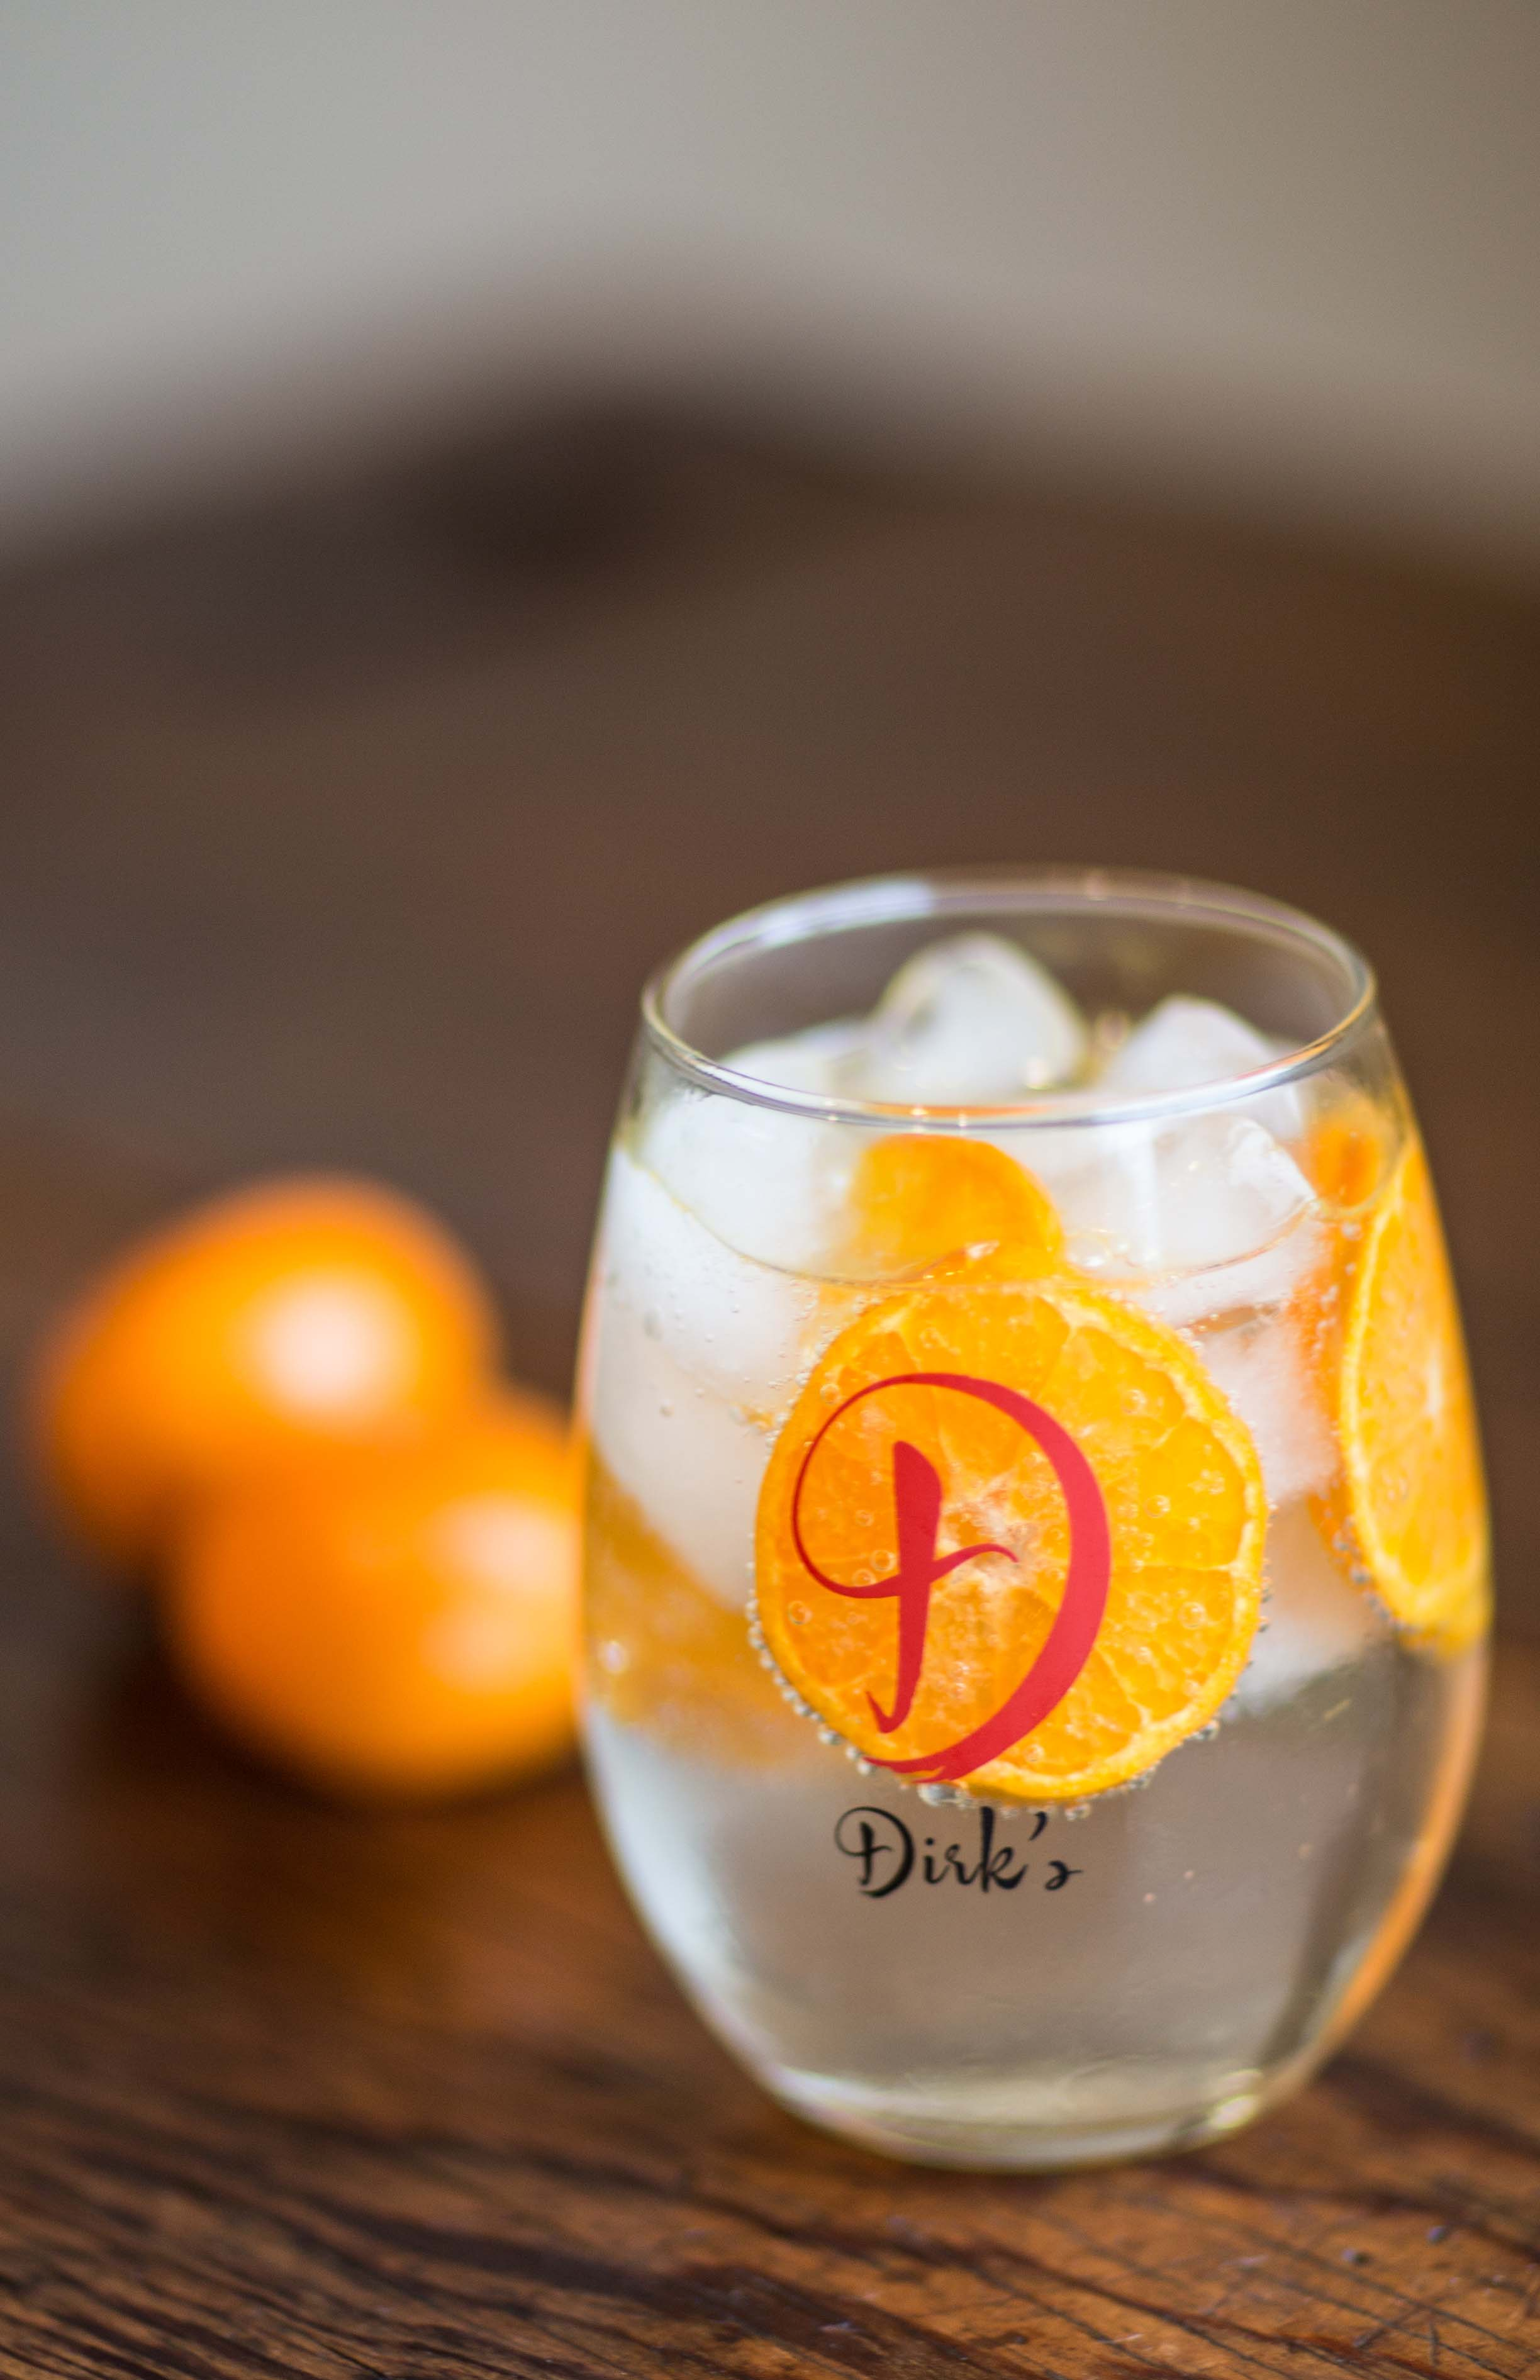 dirks_vodka_tangerine.jpg